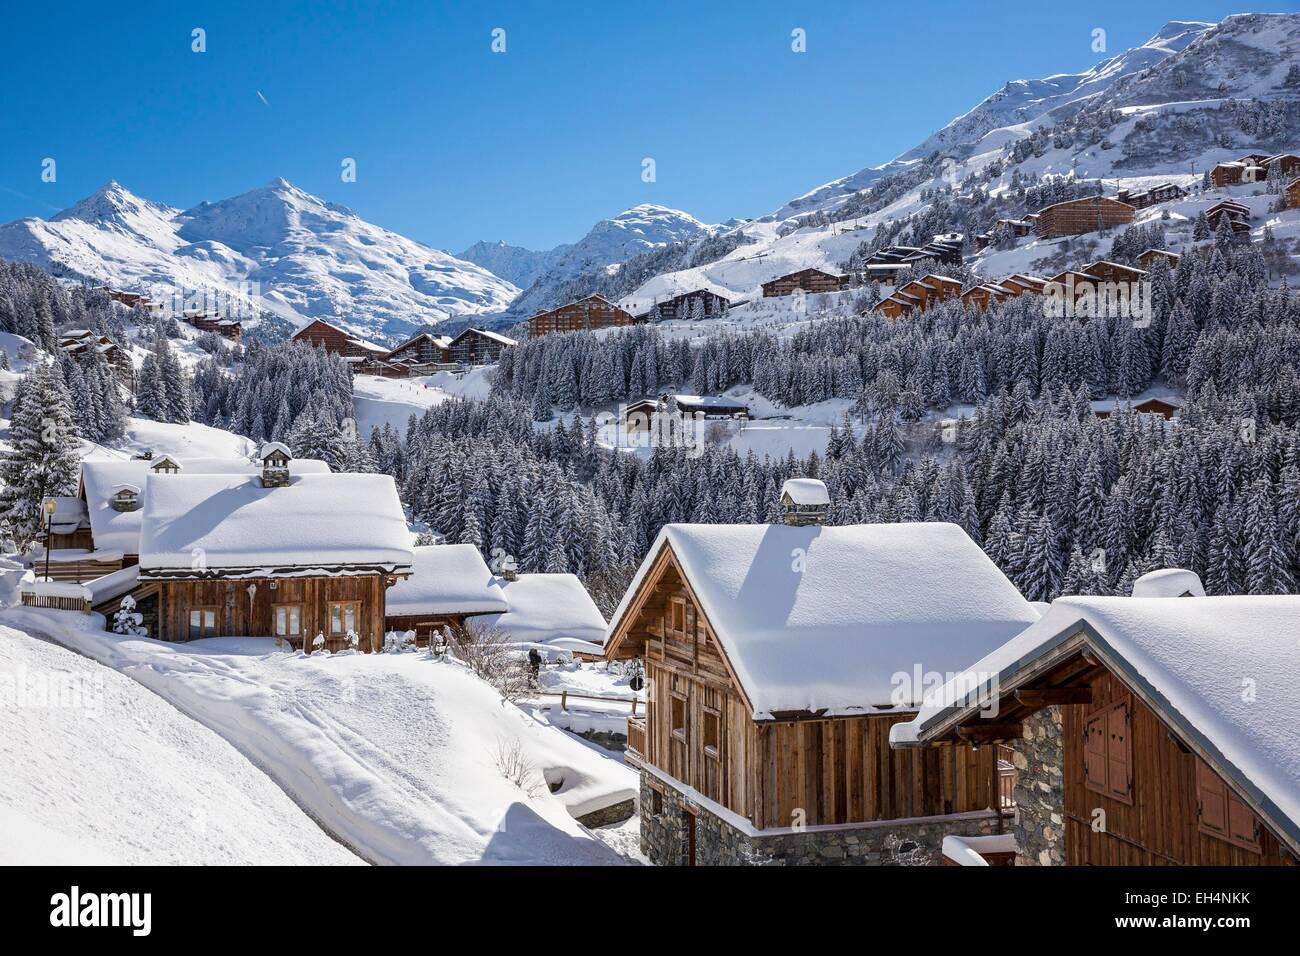 France, Savoie, Tarentaise valley, hamlet of La Rosiere, Meribel Mottaret is one of the largest ski resort village - Stock Image